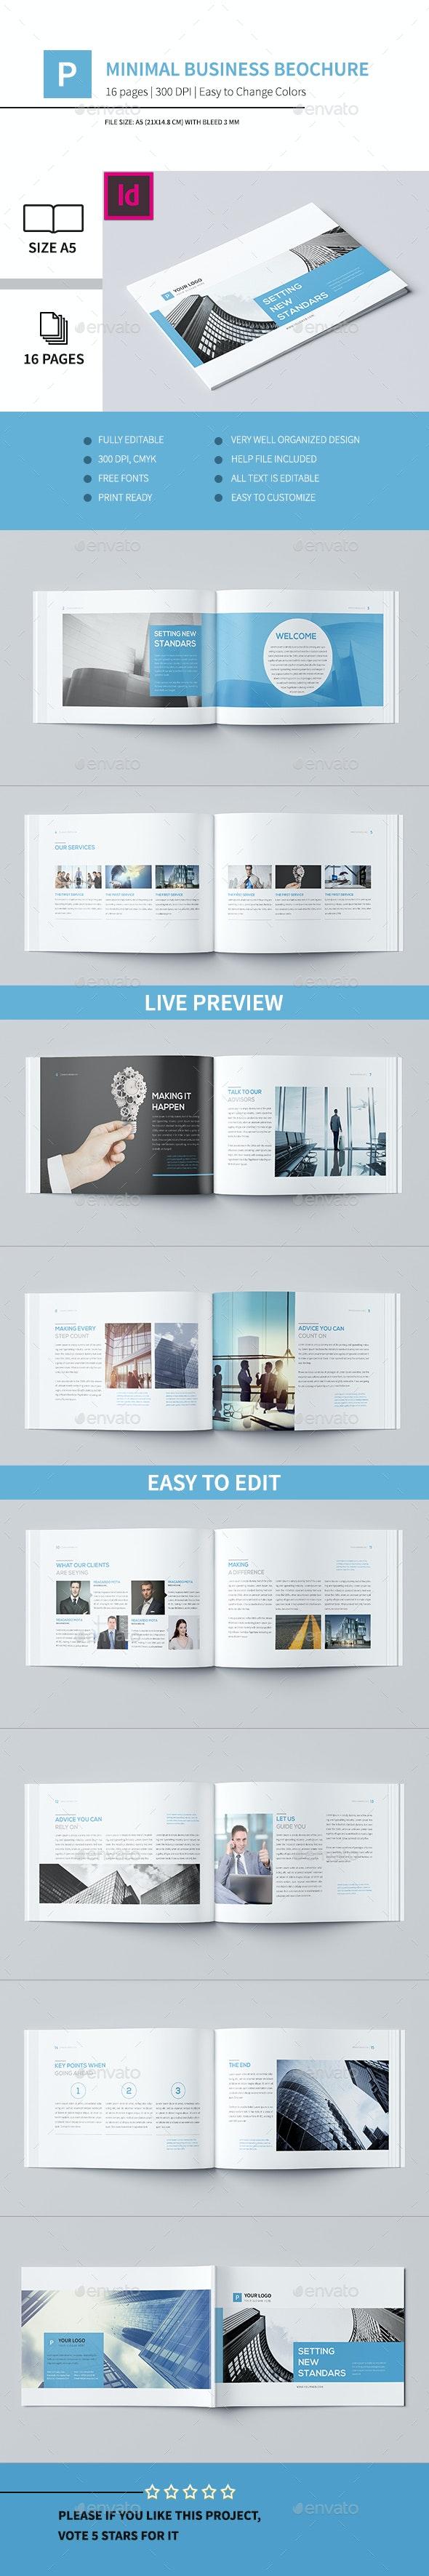 Minimal Business Brochure V - Corporate Brochures